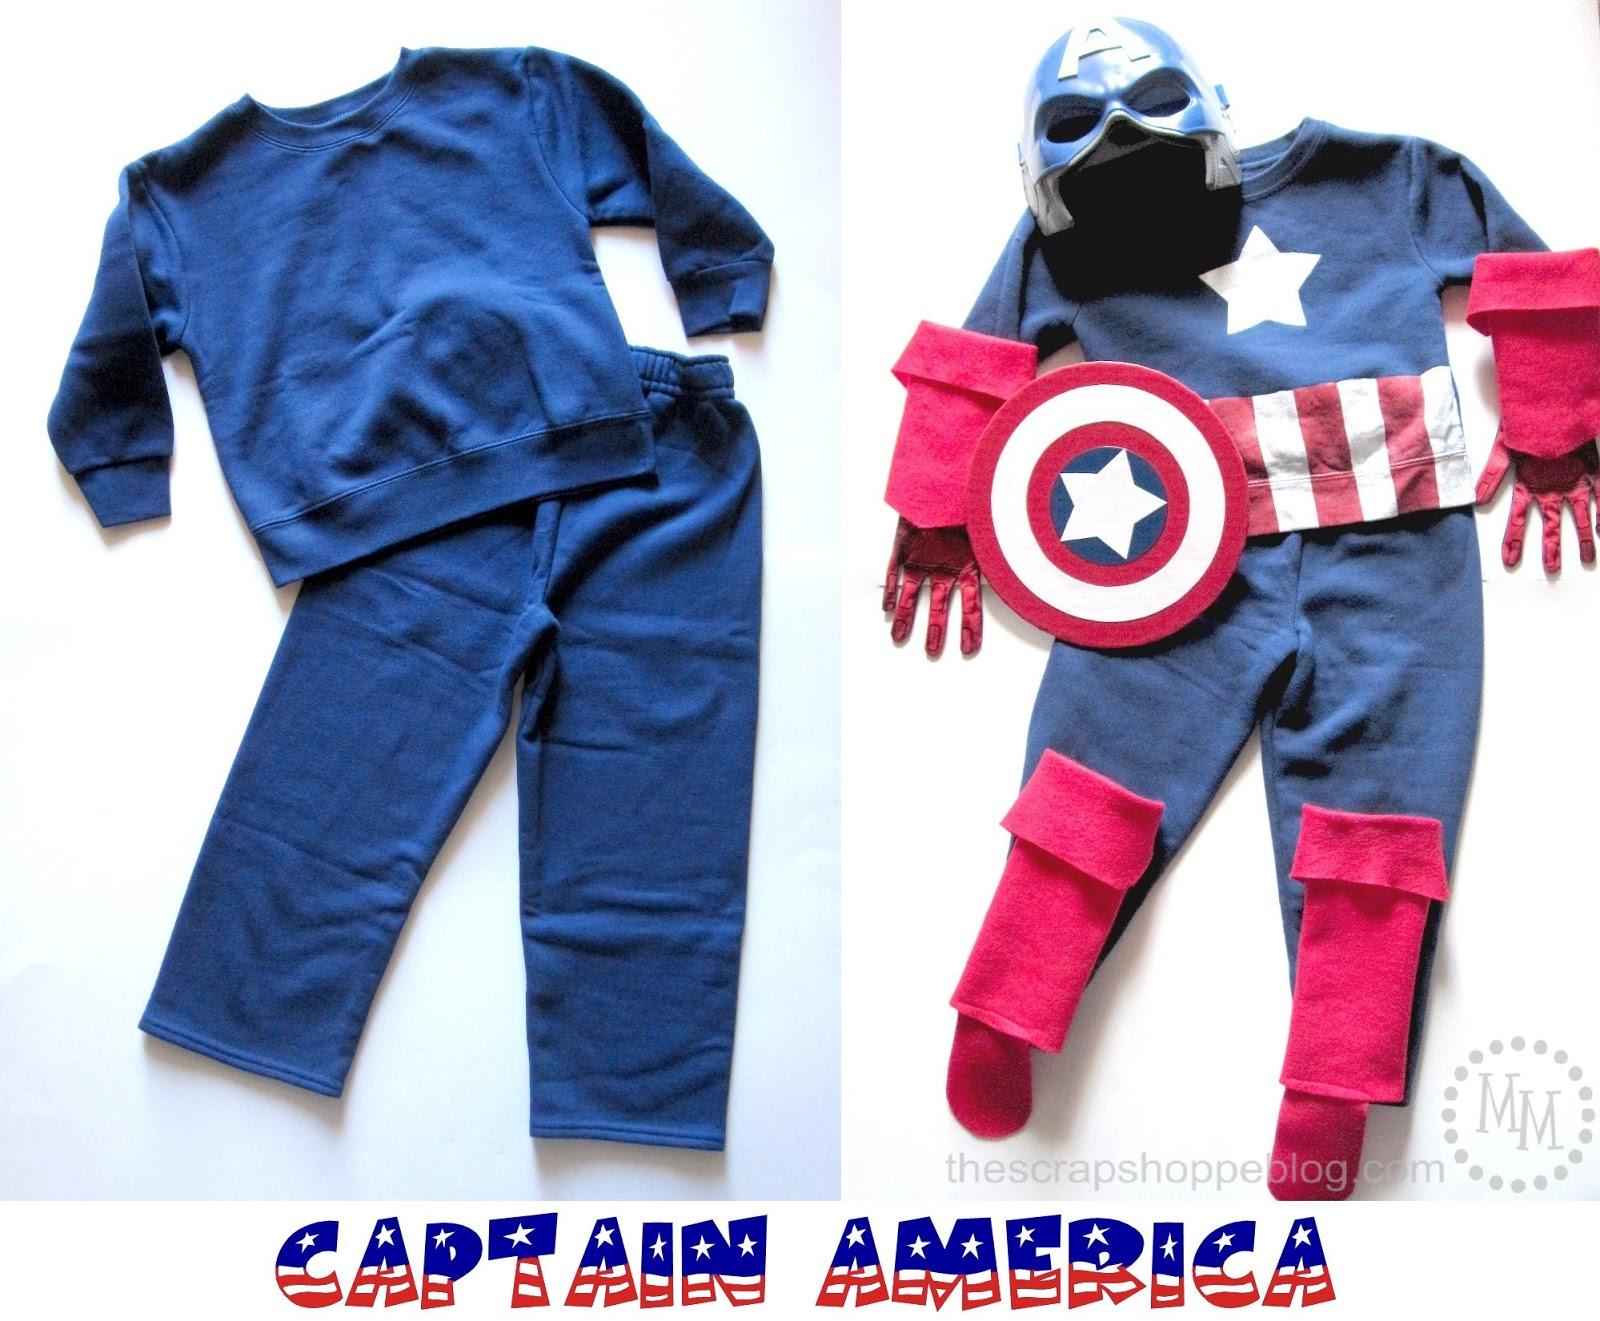 DIY Captain America u0026 Thor Costumes  sc 1 st  The Scrap Shoppe & DIY Captain America u0026 Thor Costumes - The Scrap Shoppe